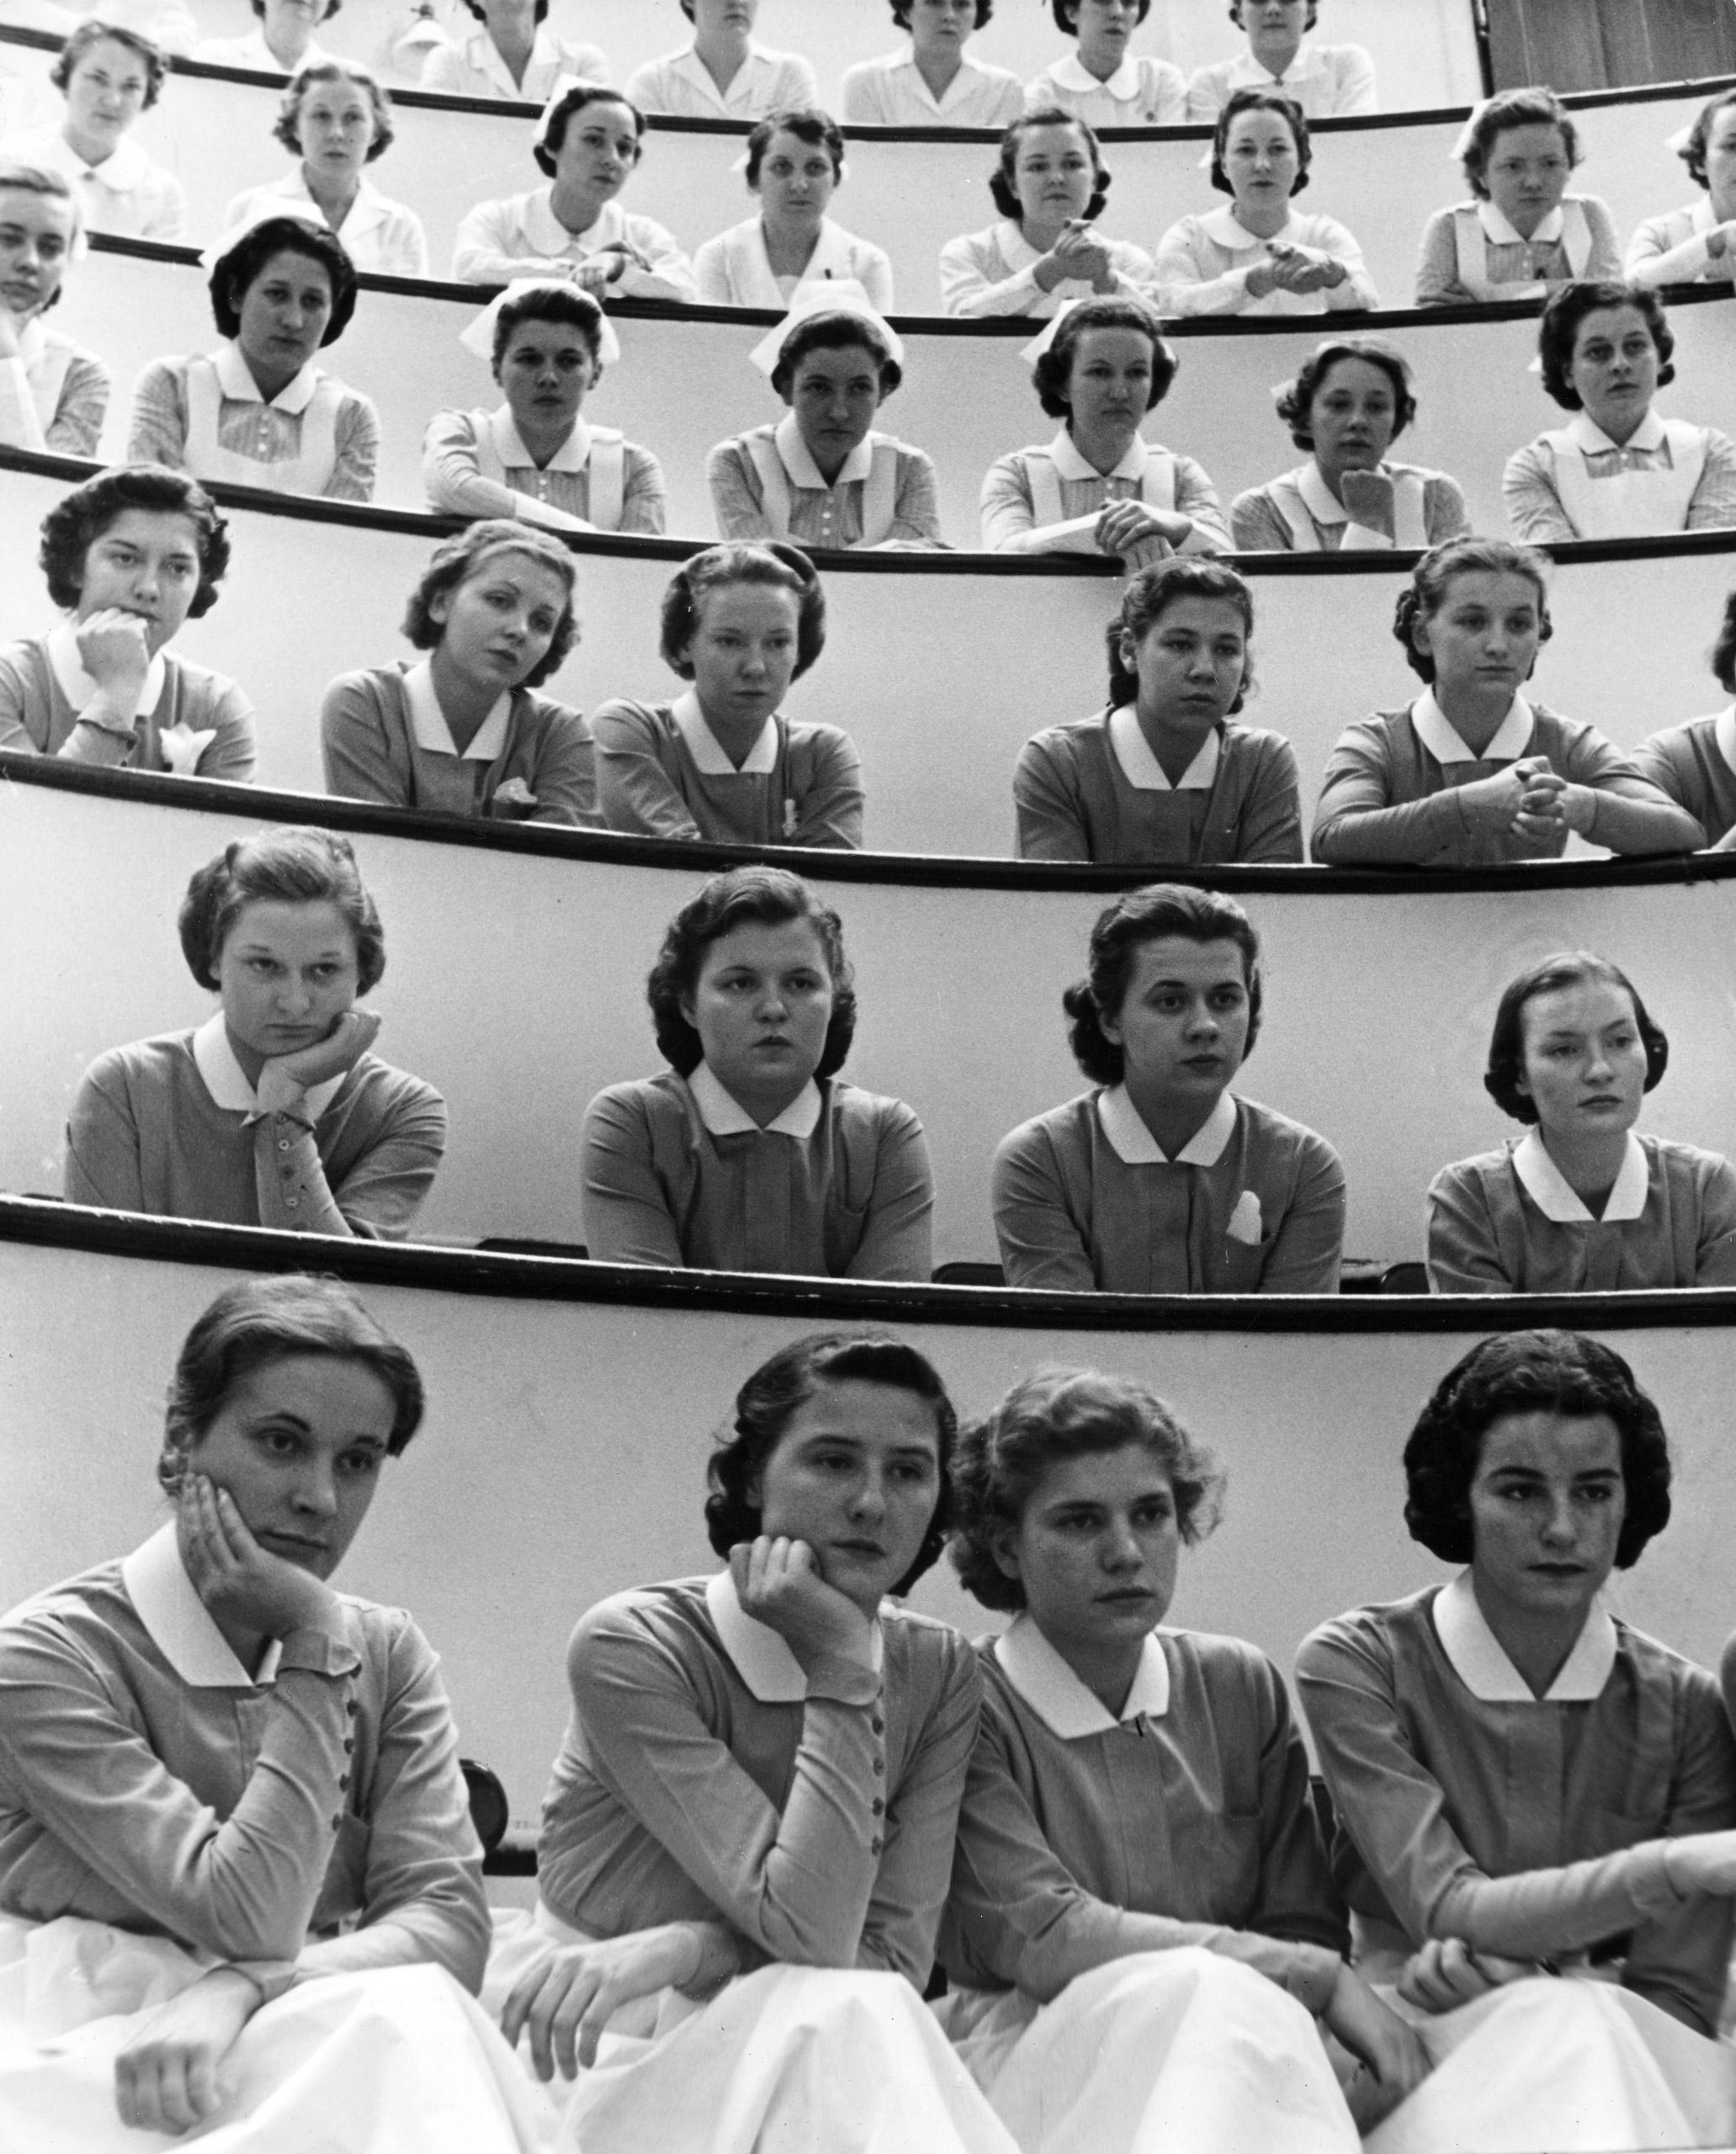 <b>Caption from LIFE.</b> Student nurses at New York's Roosevelt Hospital.